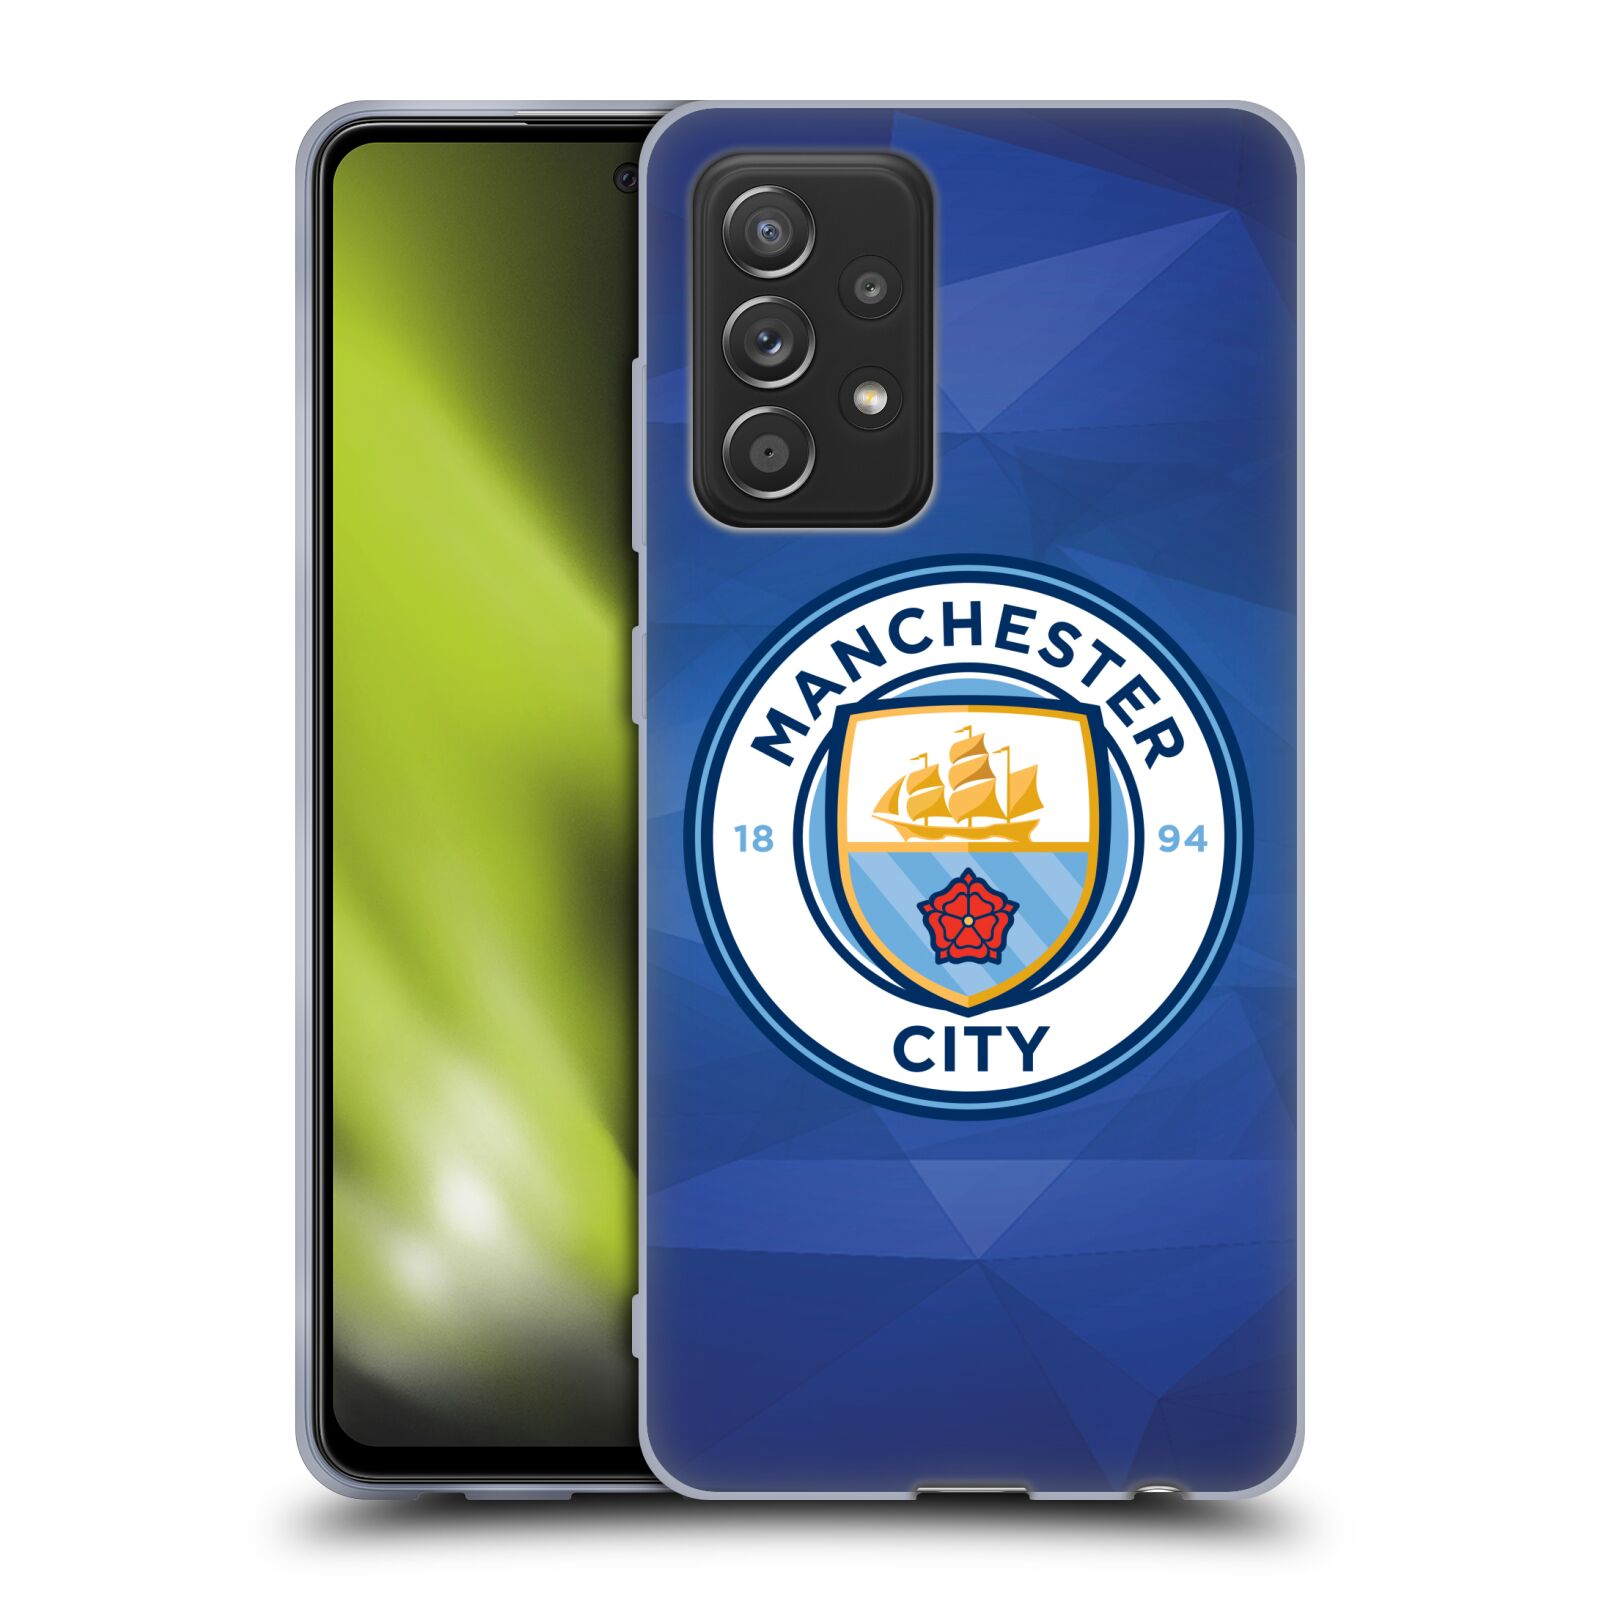 Silikonové pouzdro na mobil Samsung Galaxy A52 / A52 5G / A52s 5G - Head Case - Manchester City FC - Modré nové logo